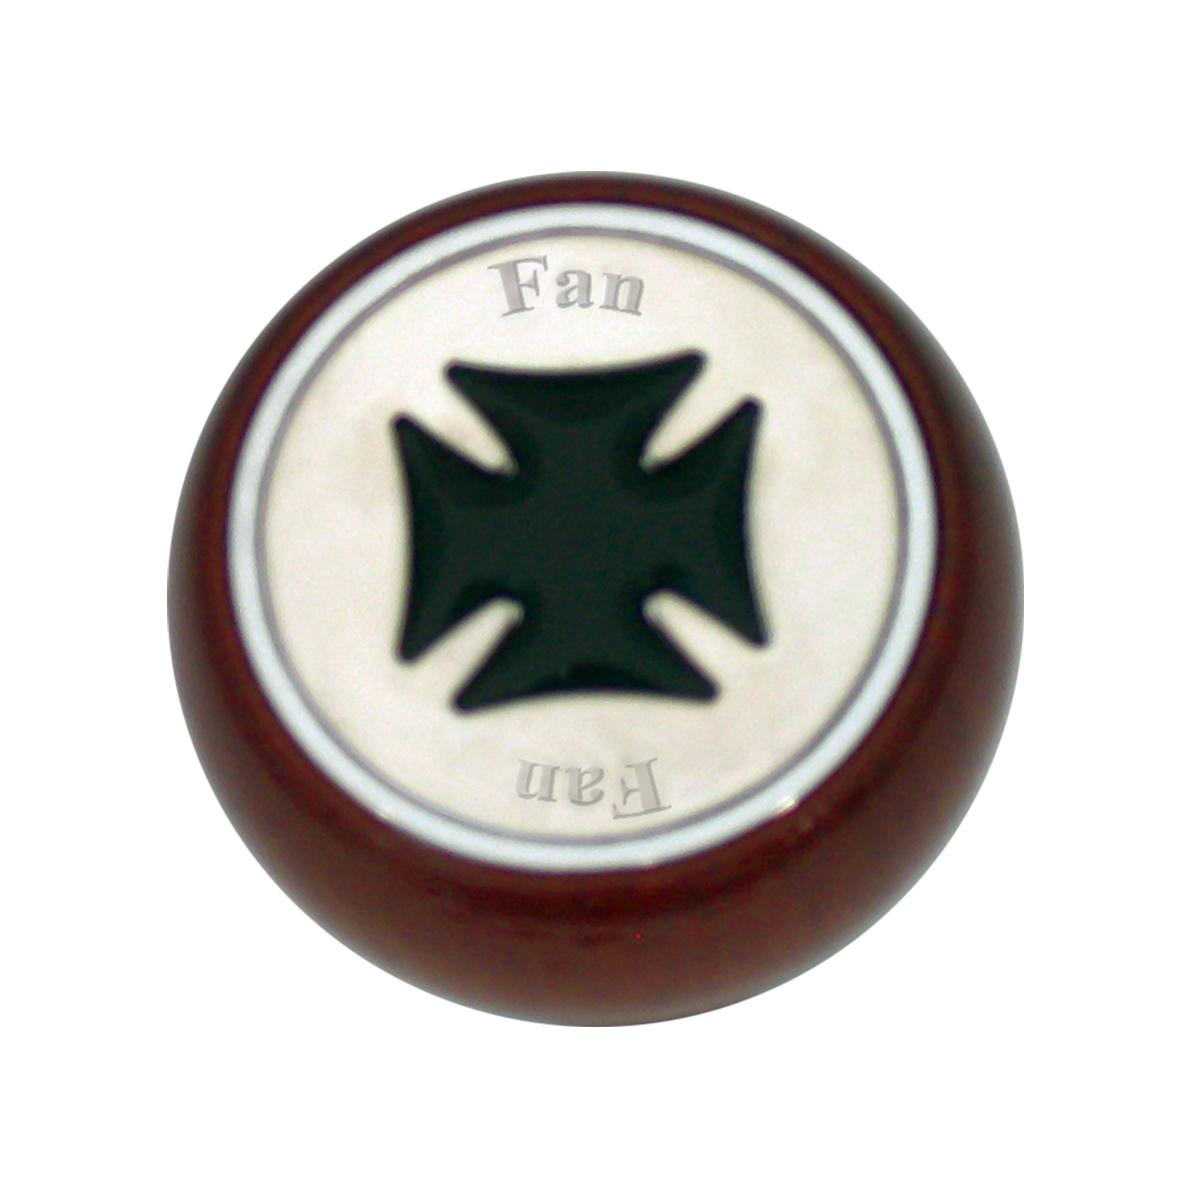 95460 Black Iron Cross Dashboard Control Knob w/ Fan Script